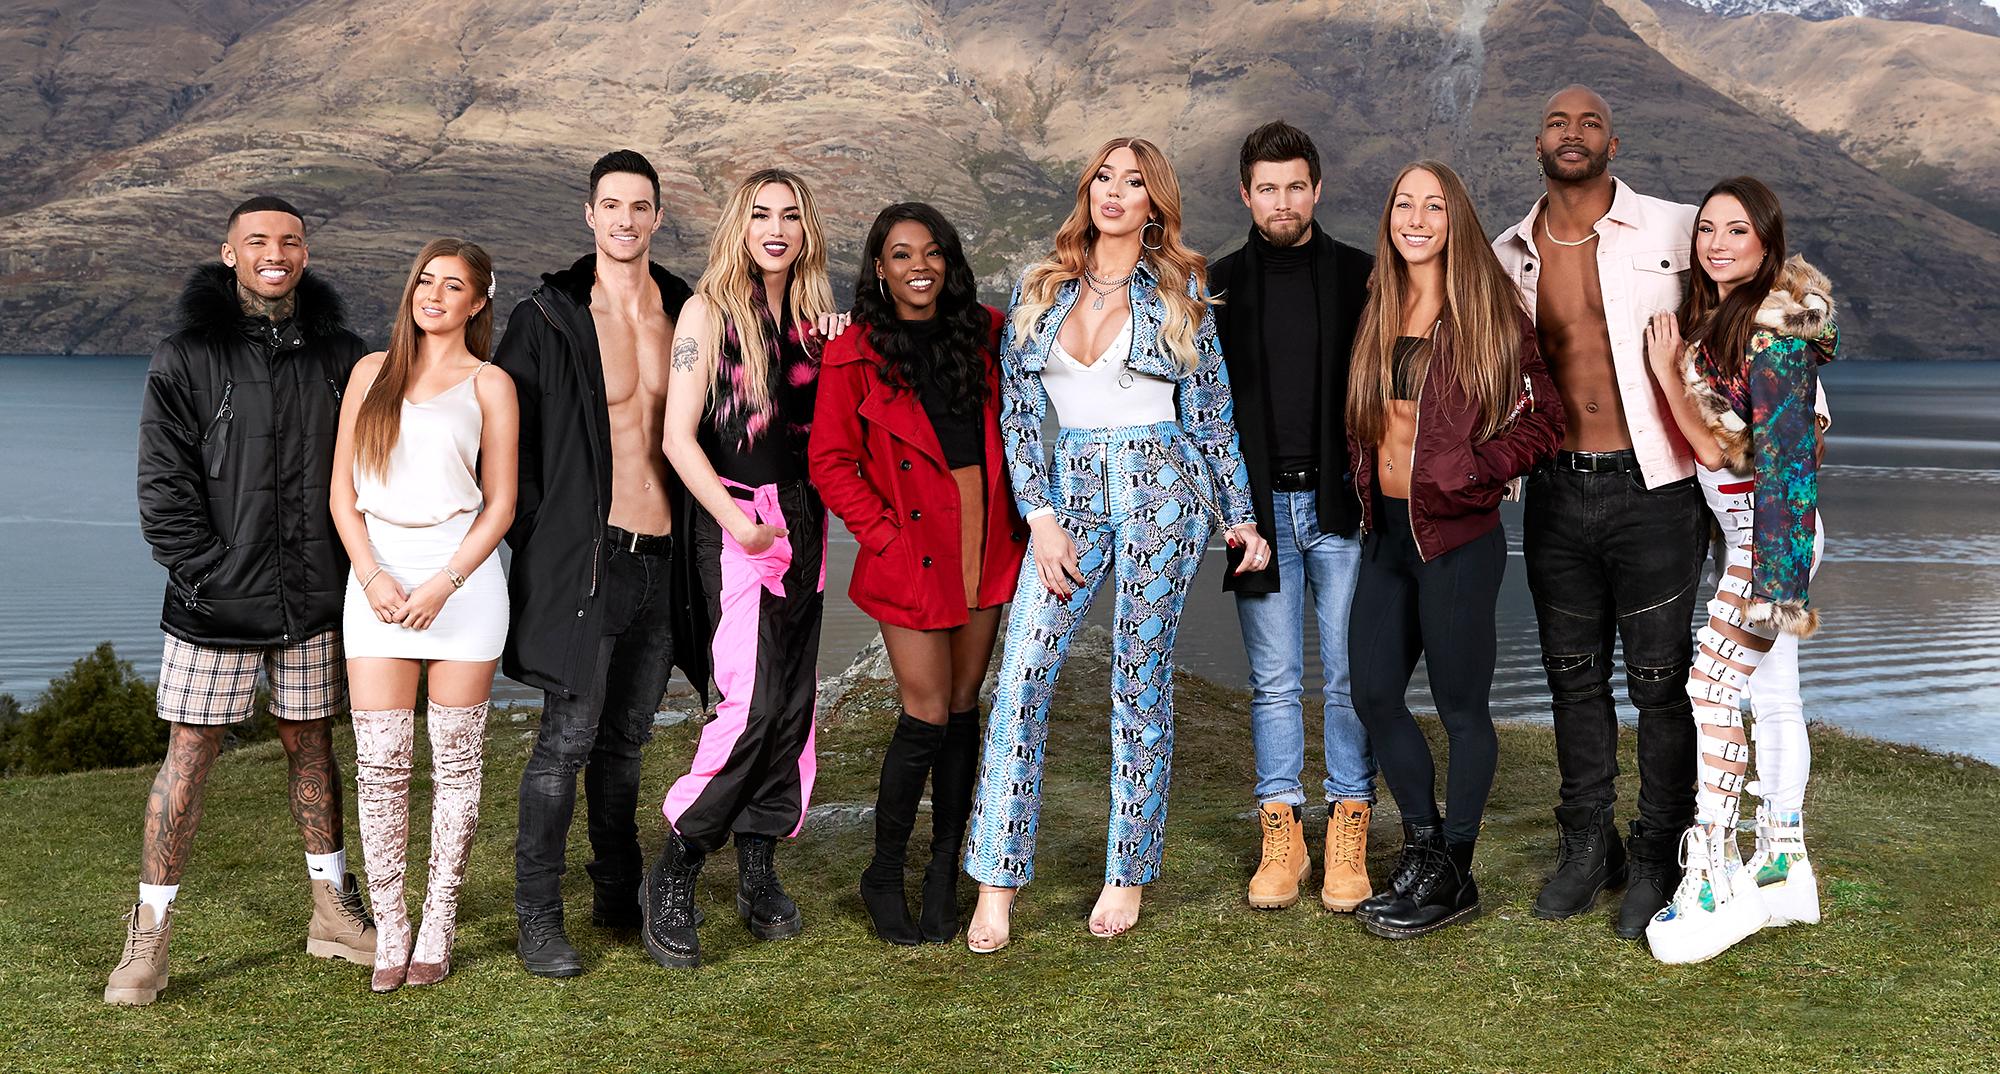 Blue Water High Cast meet the 'ex on the beach: peak of love' mtv cast: see photos